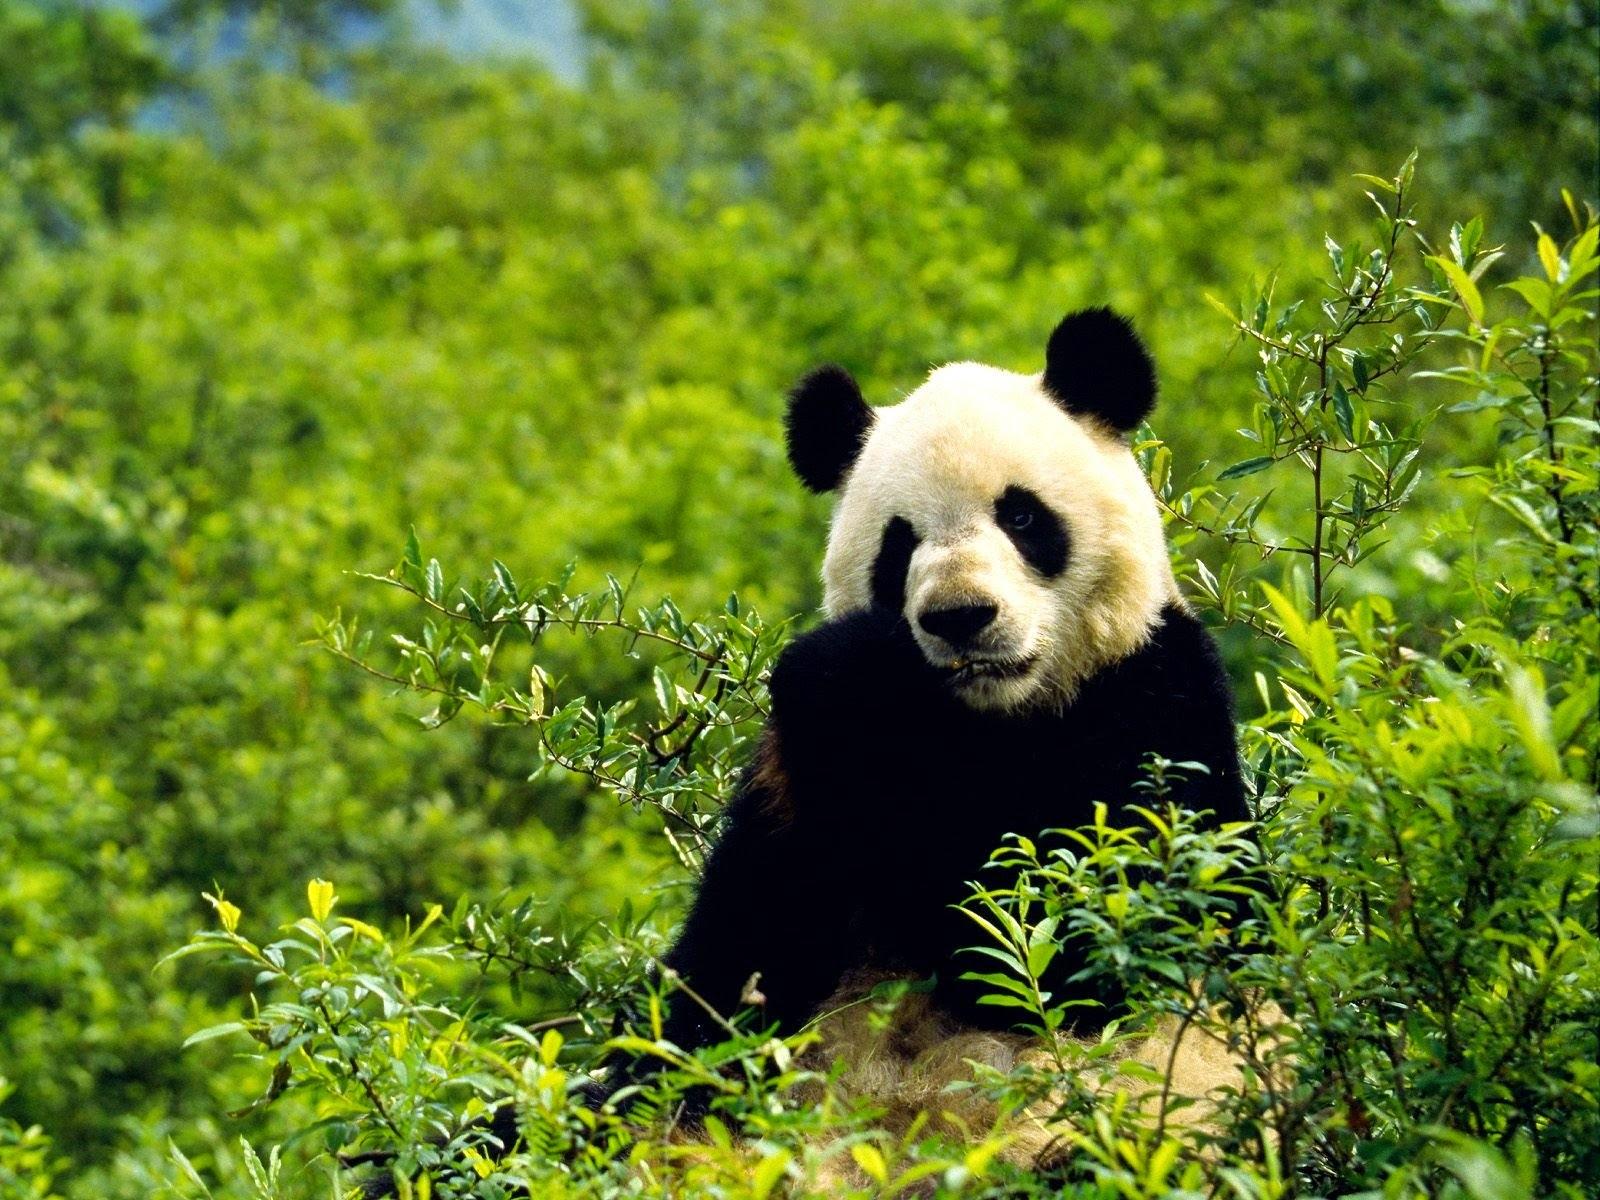 wild animal Photo, Pet Animla Photo, Pet Photo, Cute Photo, Cute animla